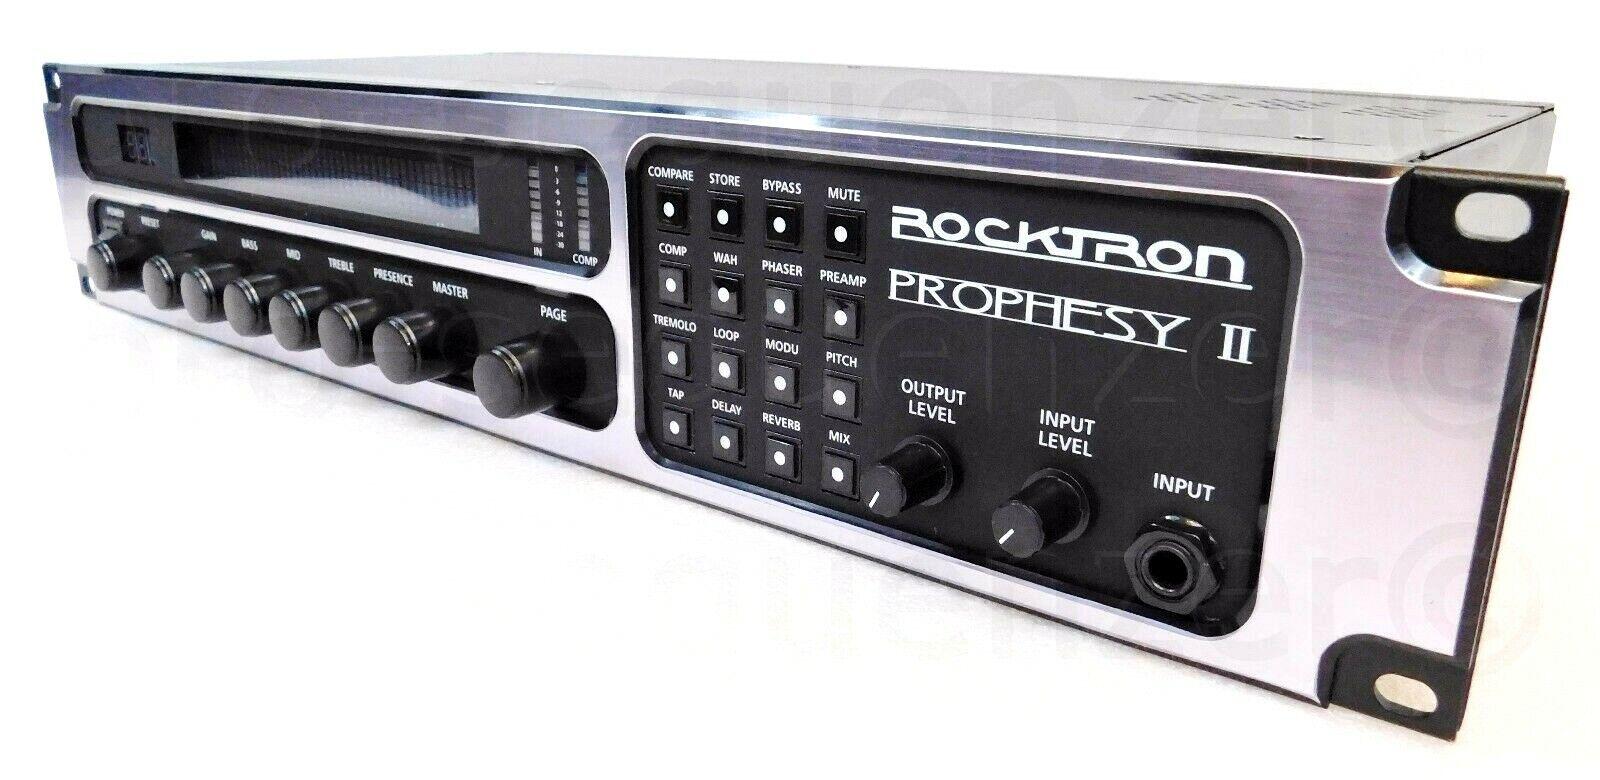 Rocktron Prophesy II 4Channel Tube Guitar Preamp Effects + 1.5 Jahre Garantie